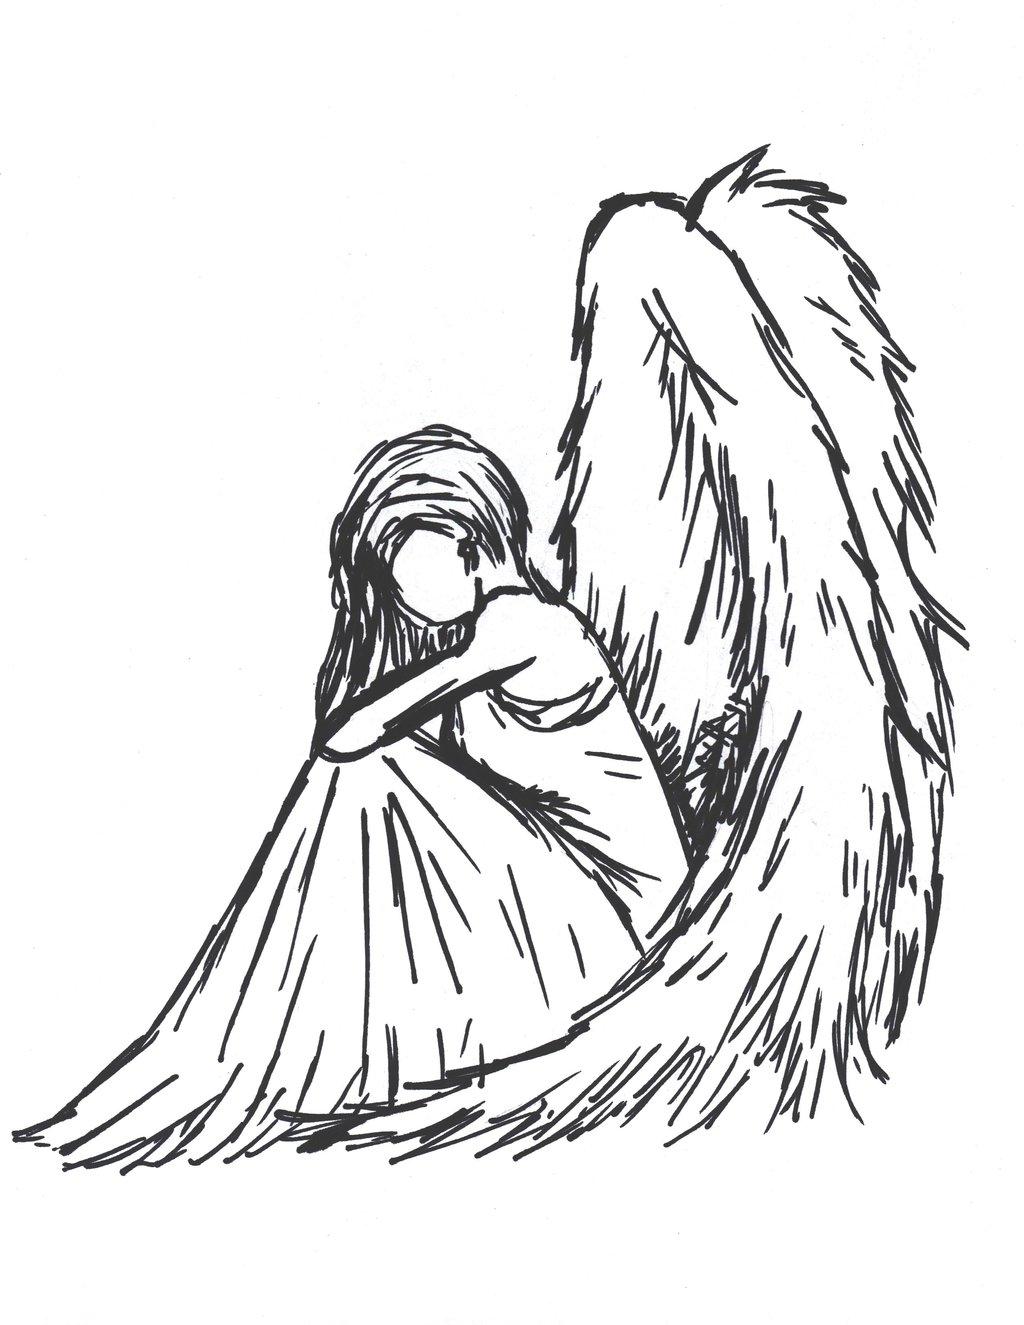 1024x1325 Sioban Mckey Sad Angel By Sioban Mckey On And Tumblr